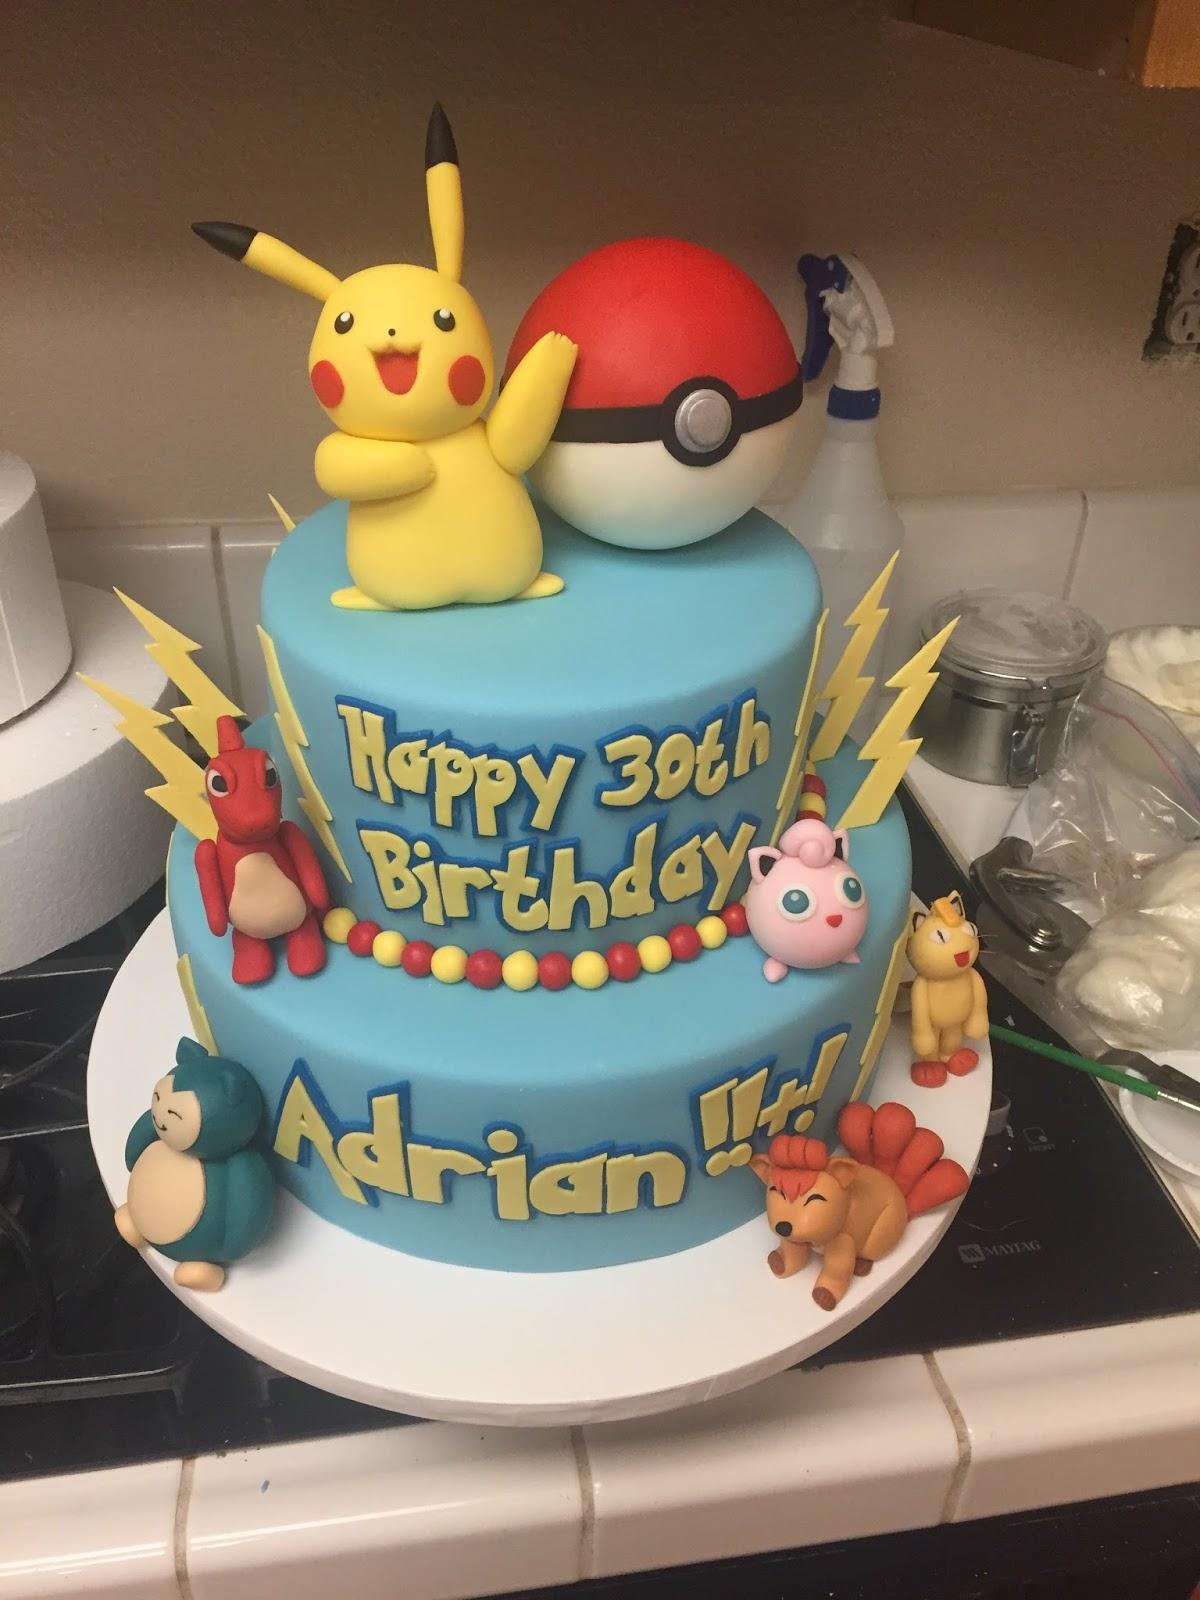 The Pokemon Pikachu Cake